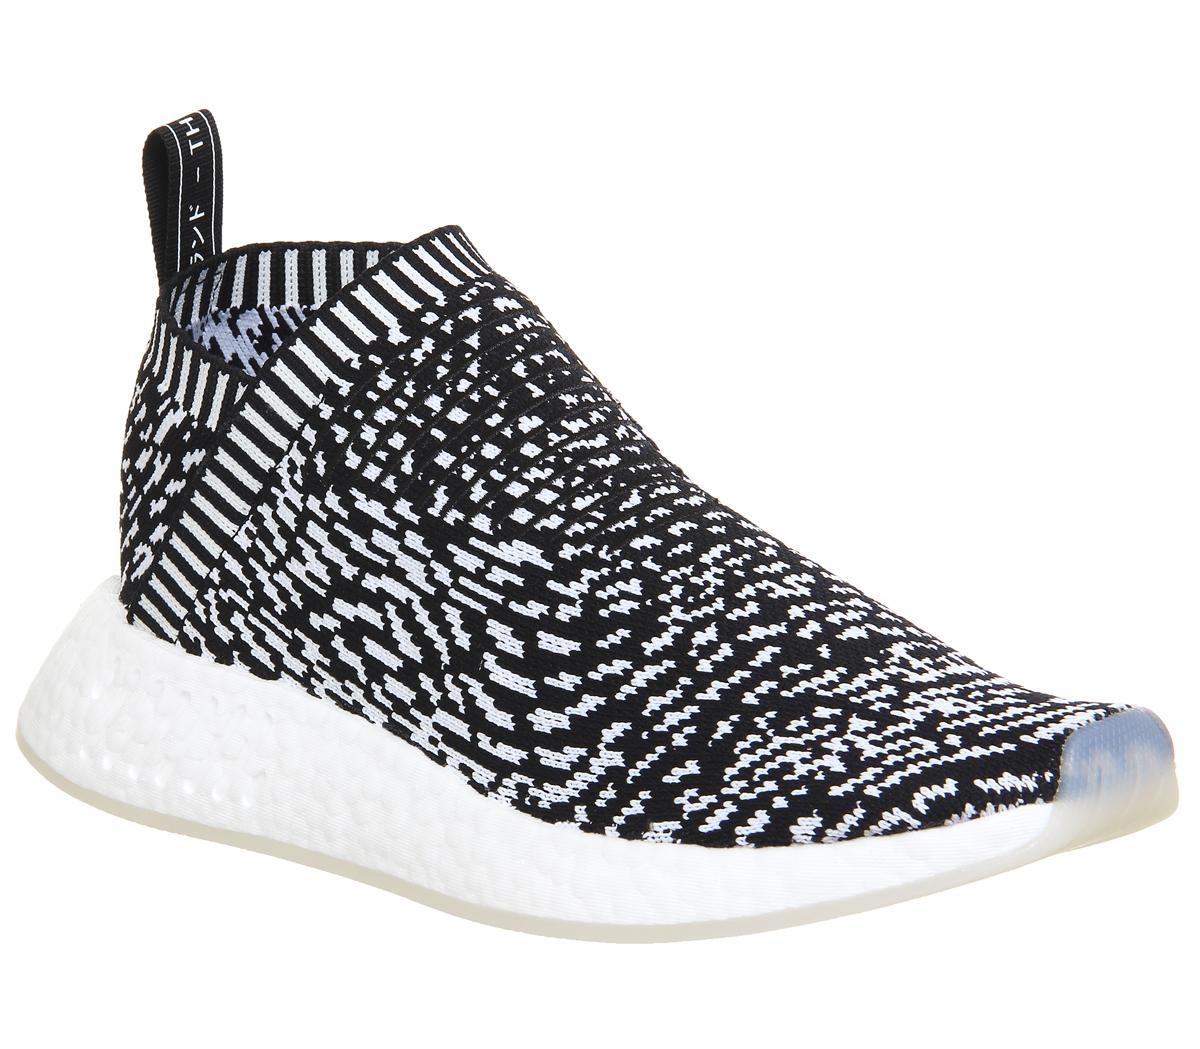 adidas Nmd CS2 Pk Core Black White